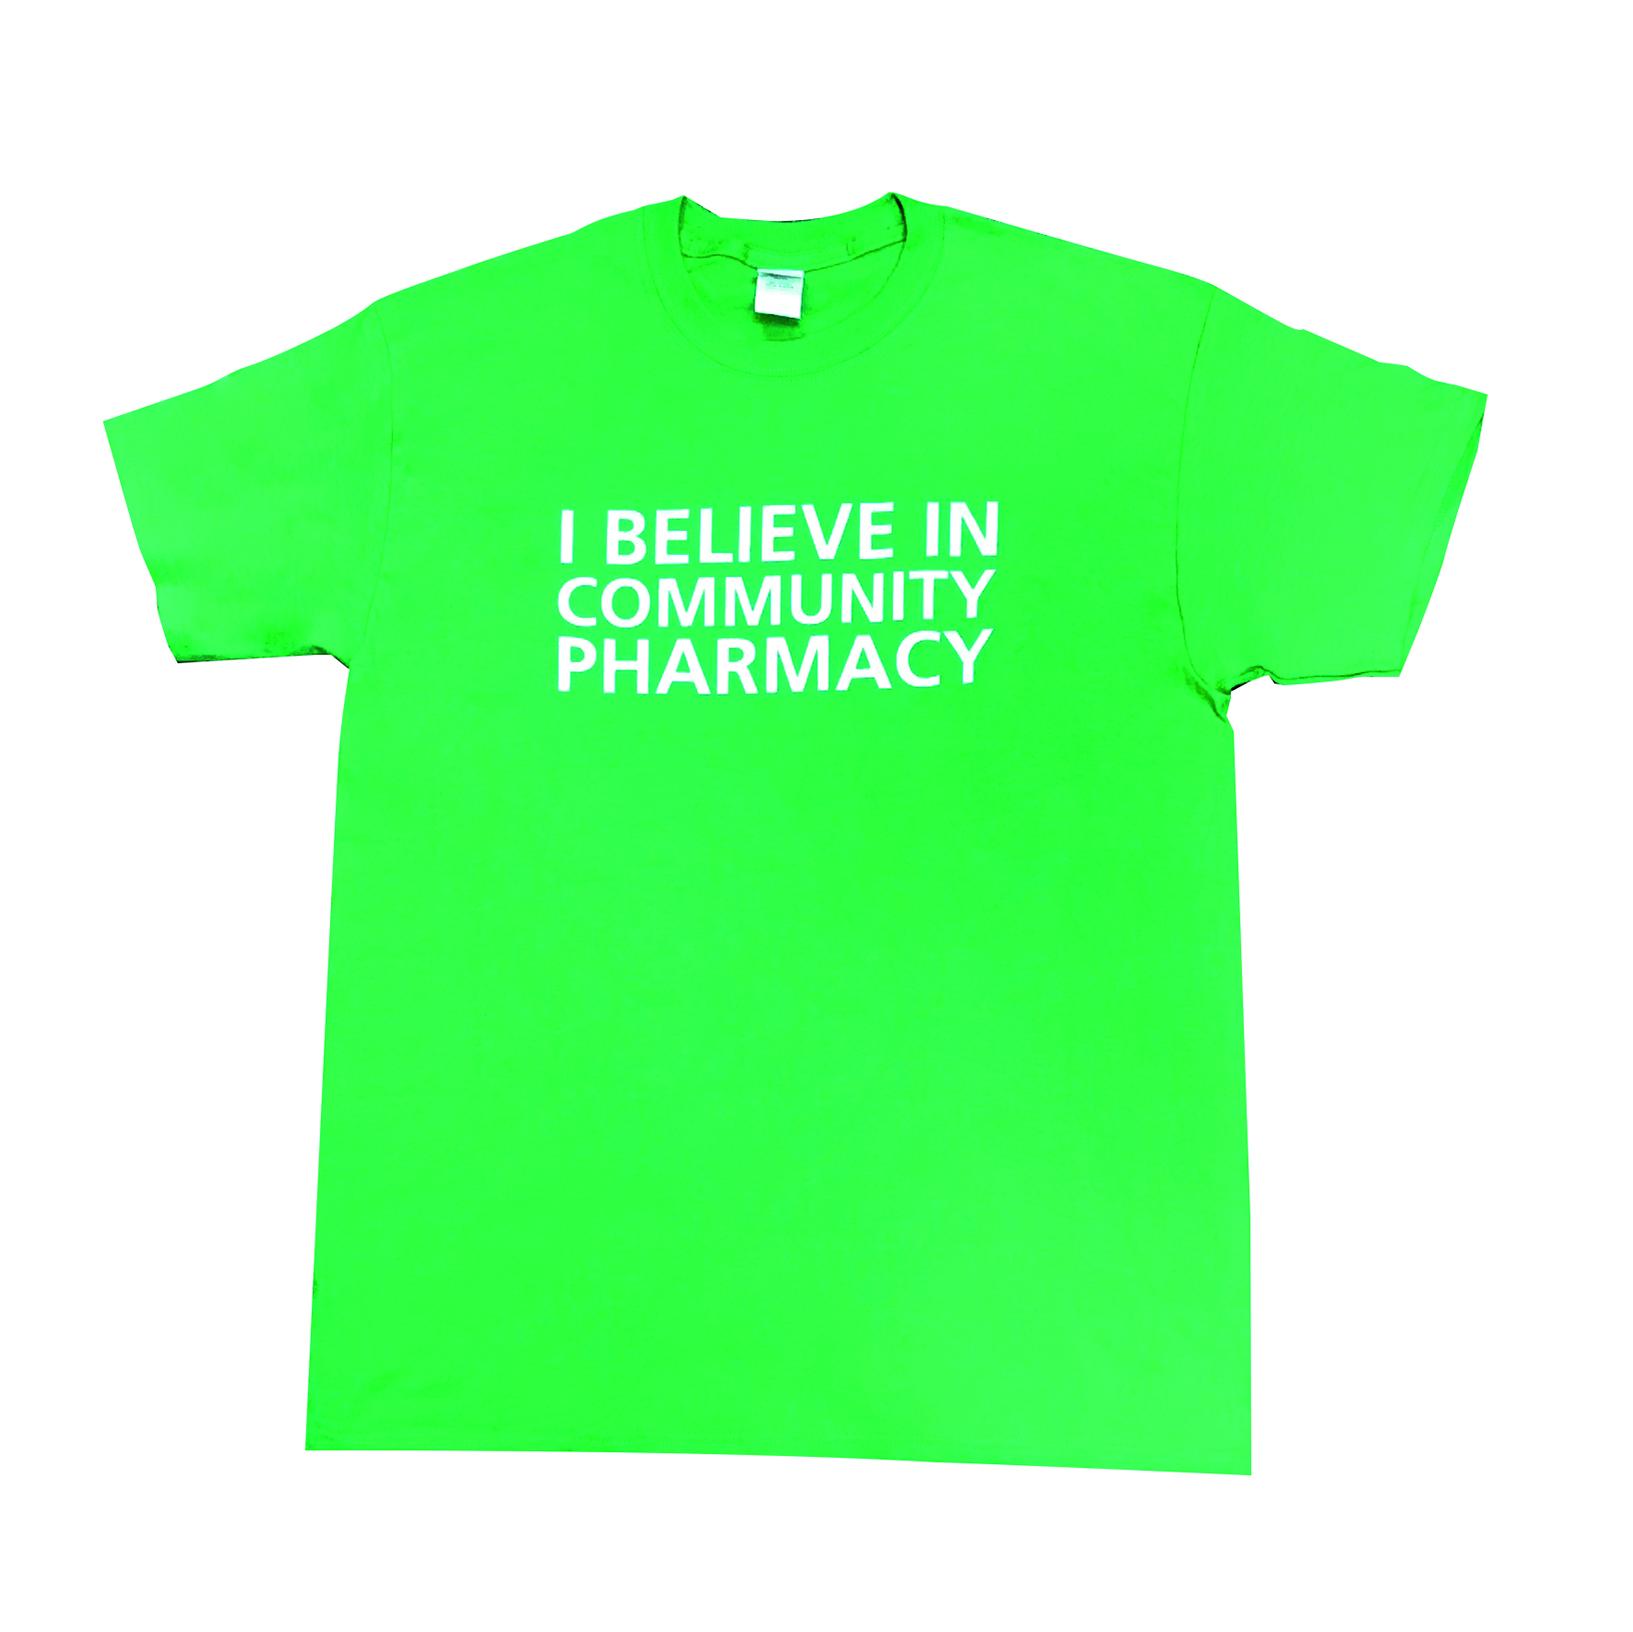 I BELIEVE IN COMMUNITY PHARMACY! T-Shirt